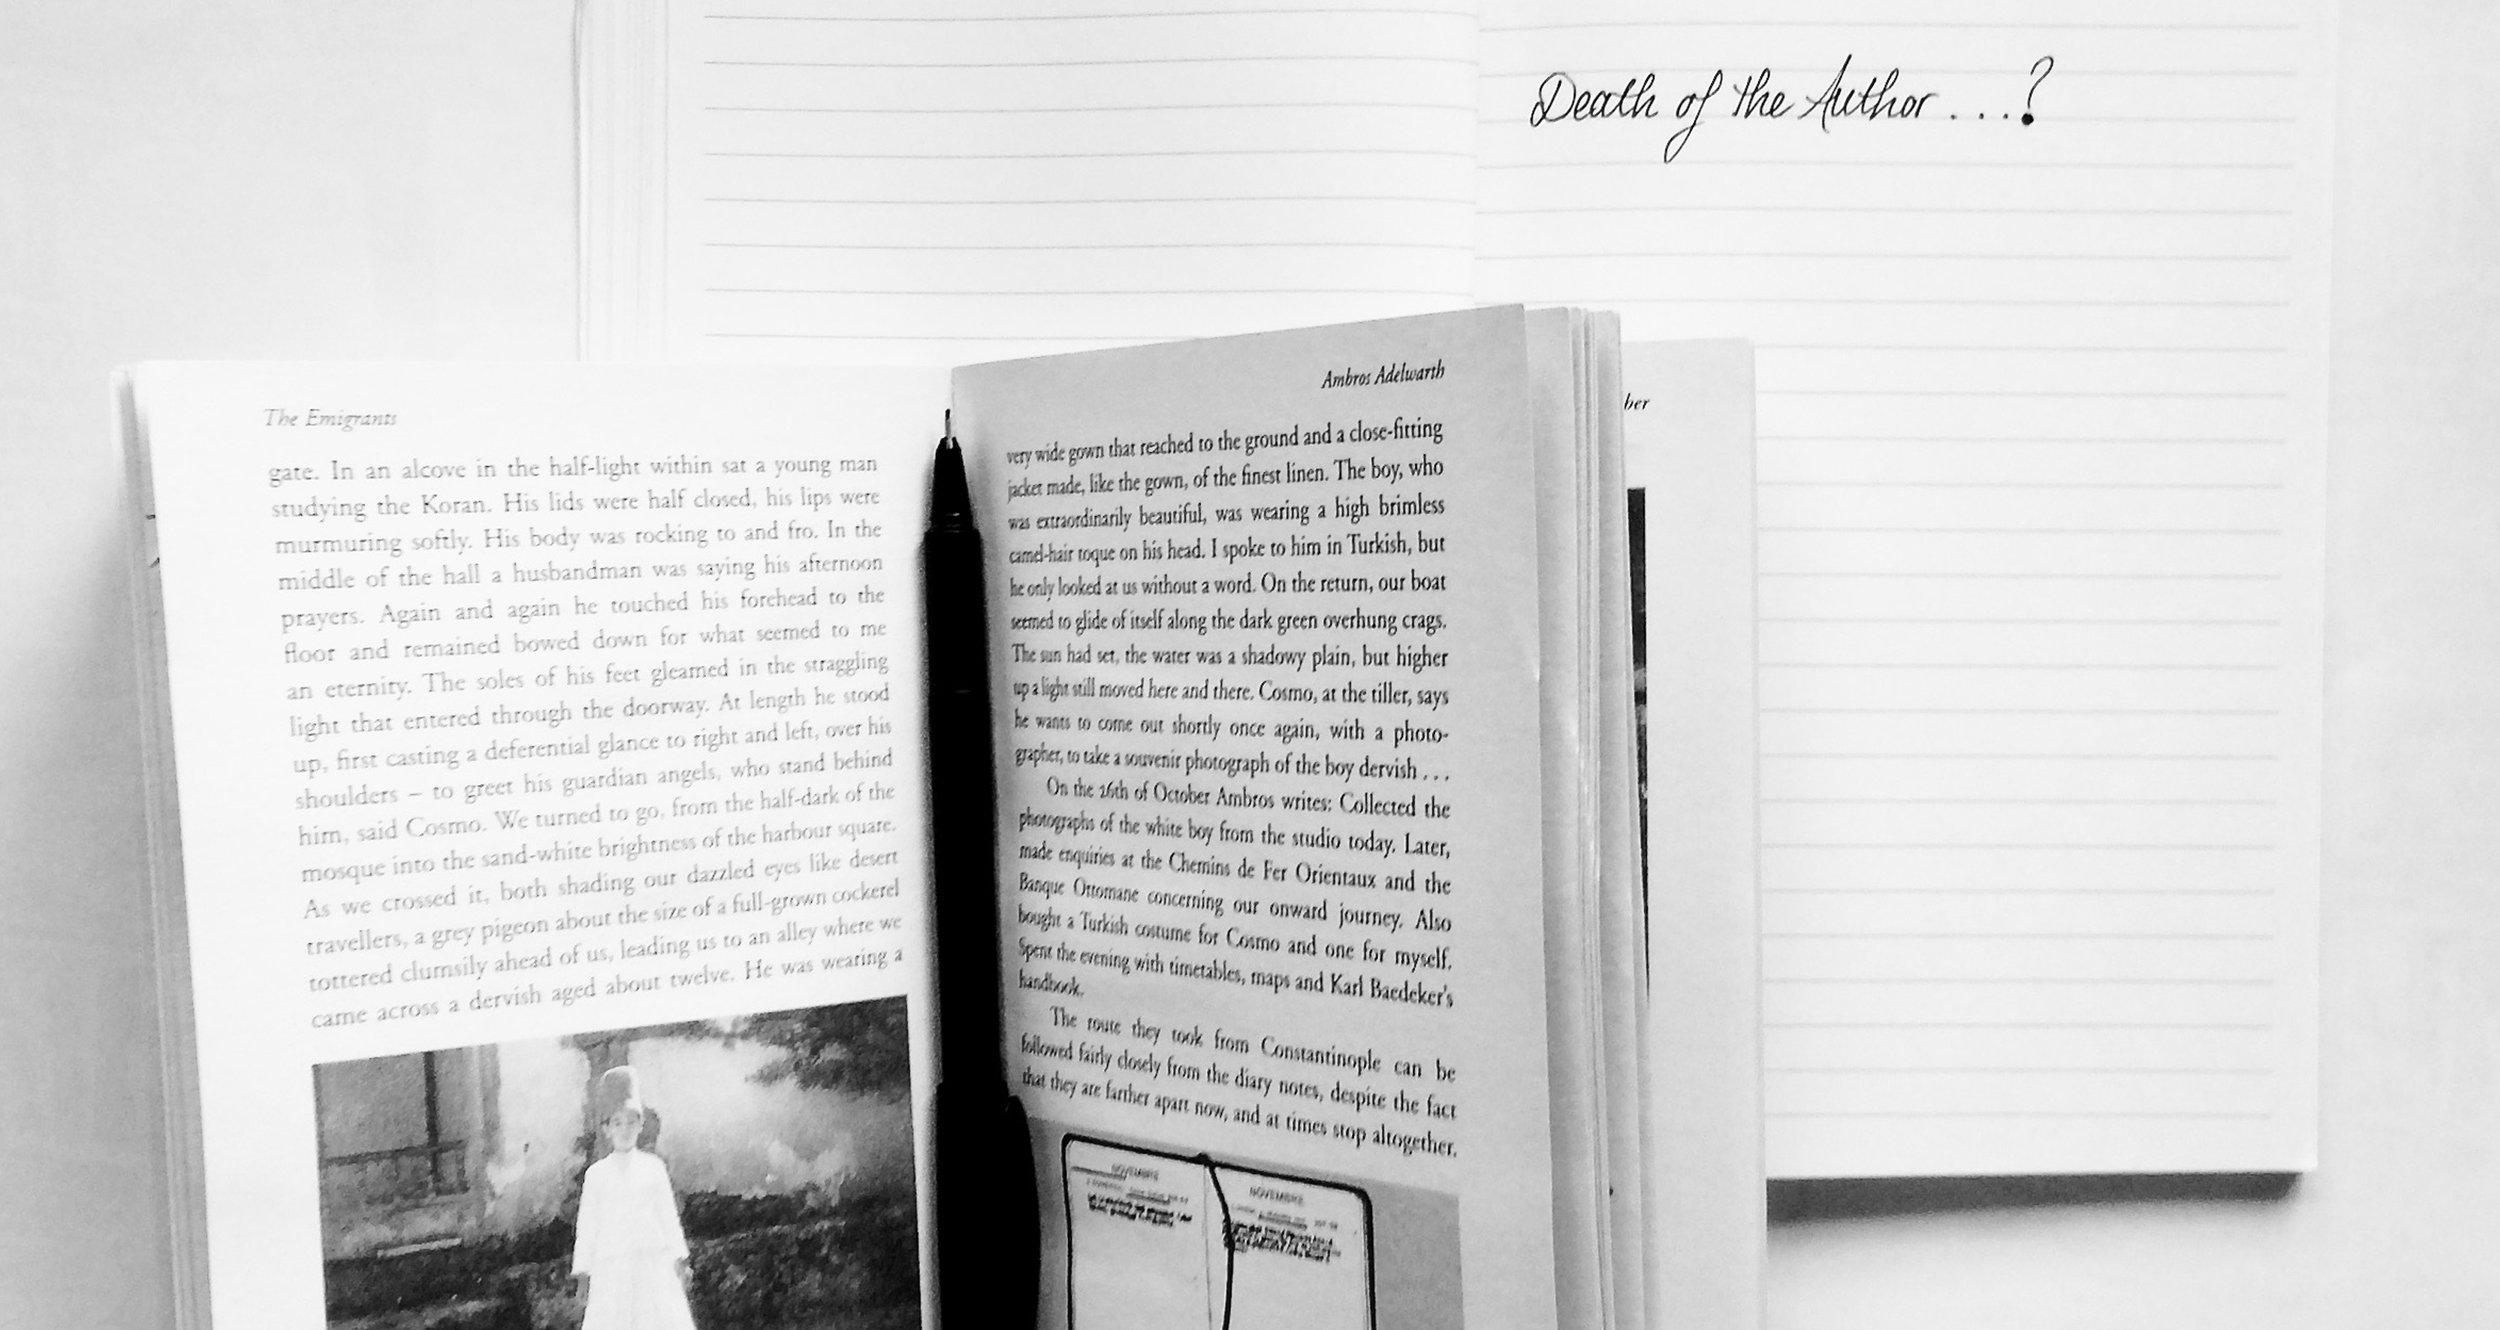 PART 6 - W.G. SEBALD'S USE OF PHOTOGRAPHS